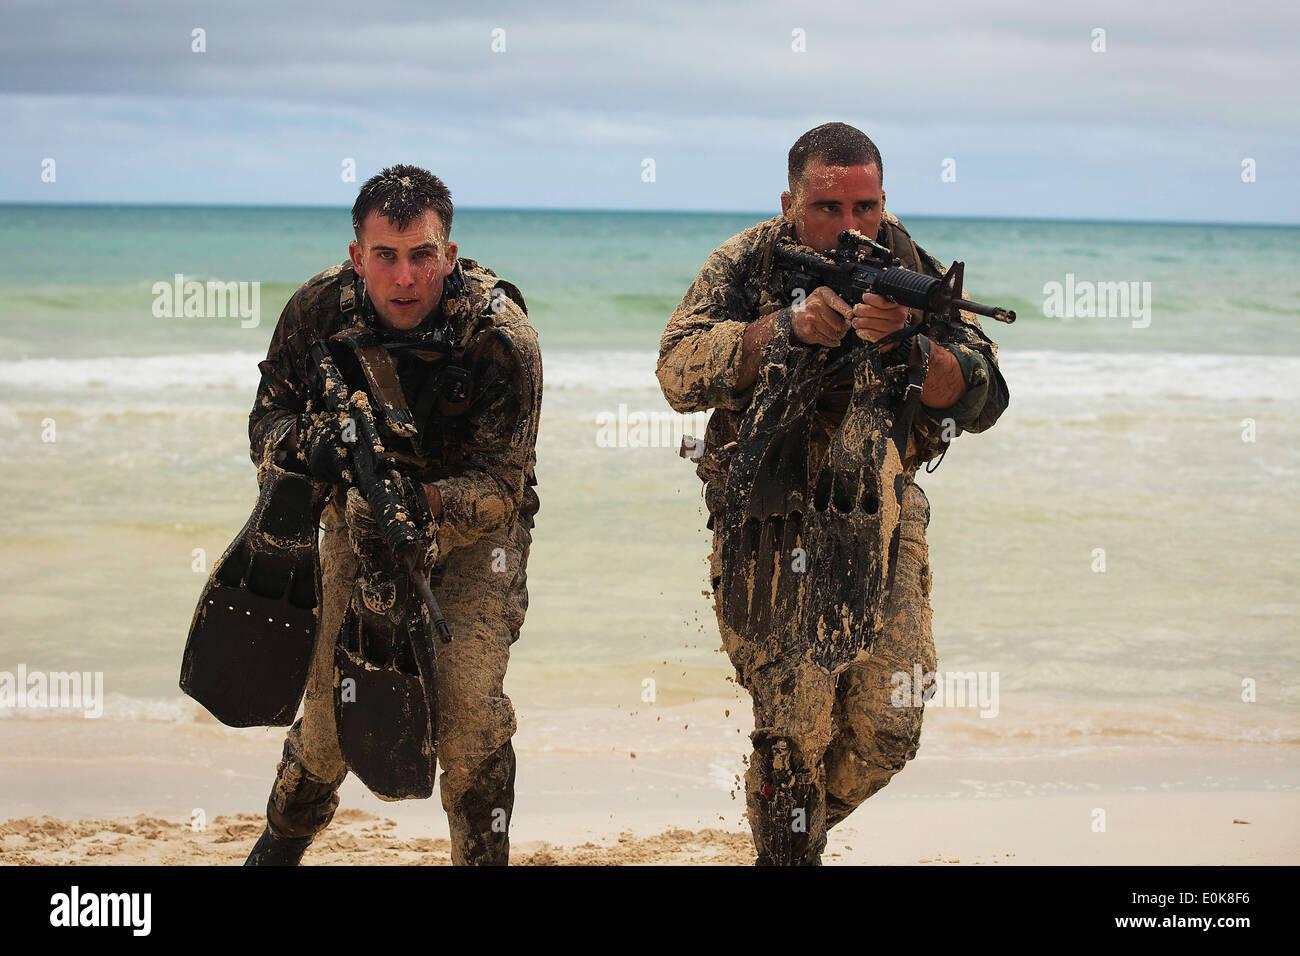 Cpl. Jonathon Schannep and Sgt. Daniel Kahn, force reconnaissance Marines with 4th Force Reconnaissance Company, Stock Photo